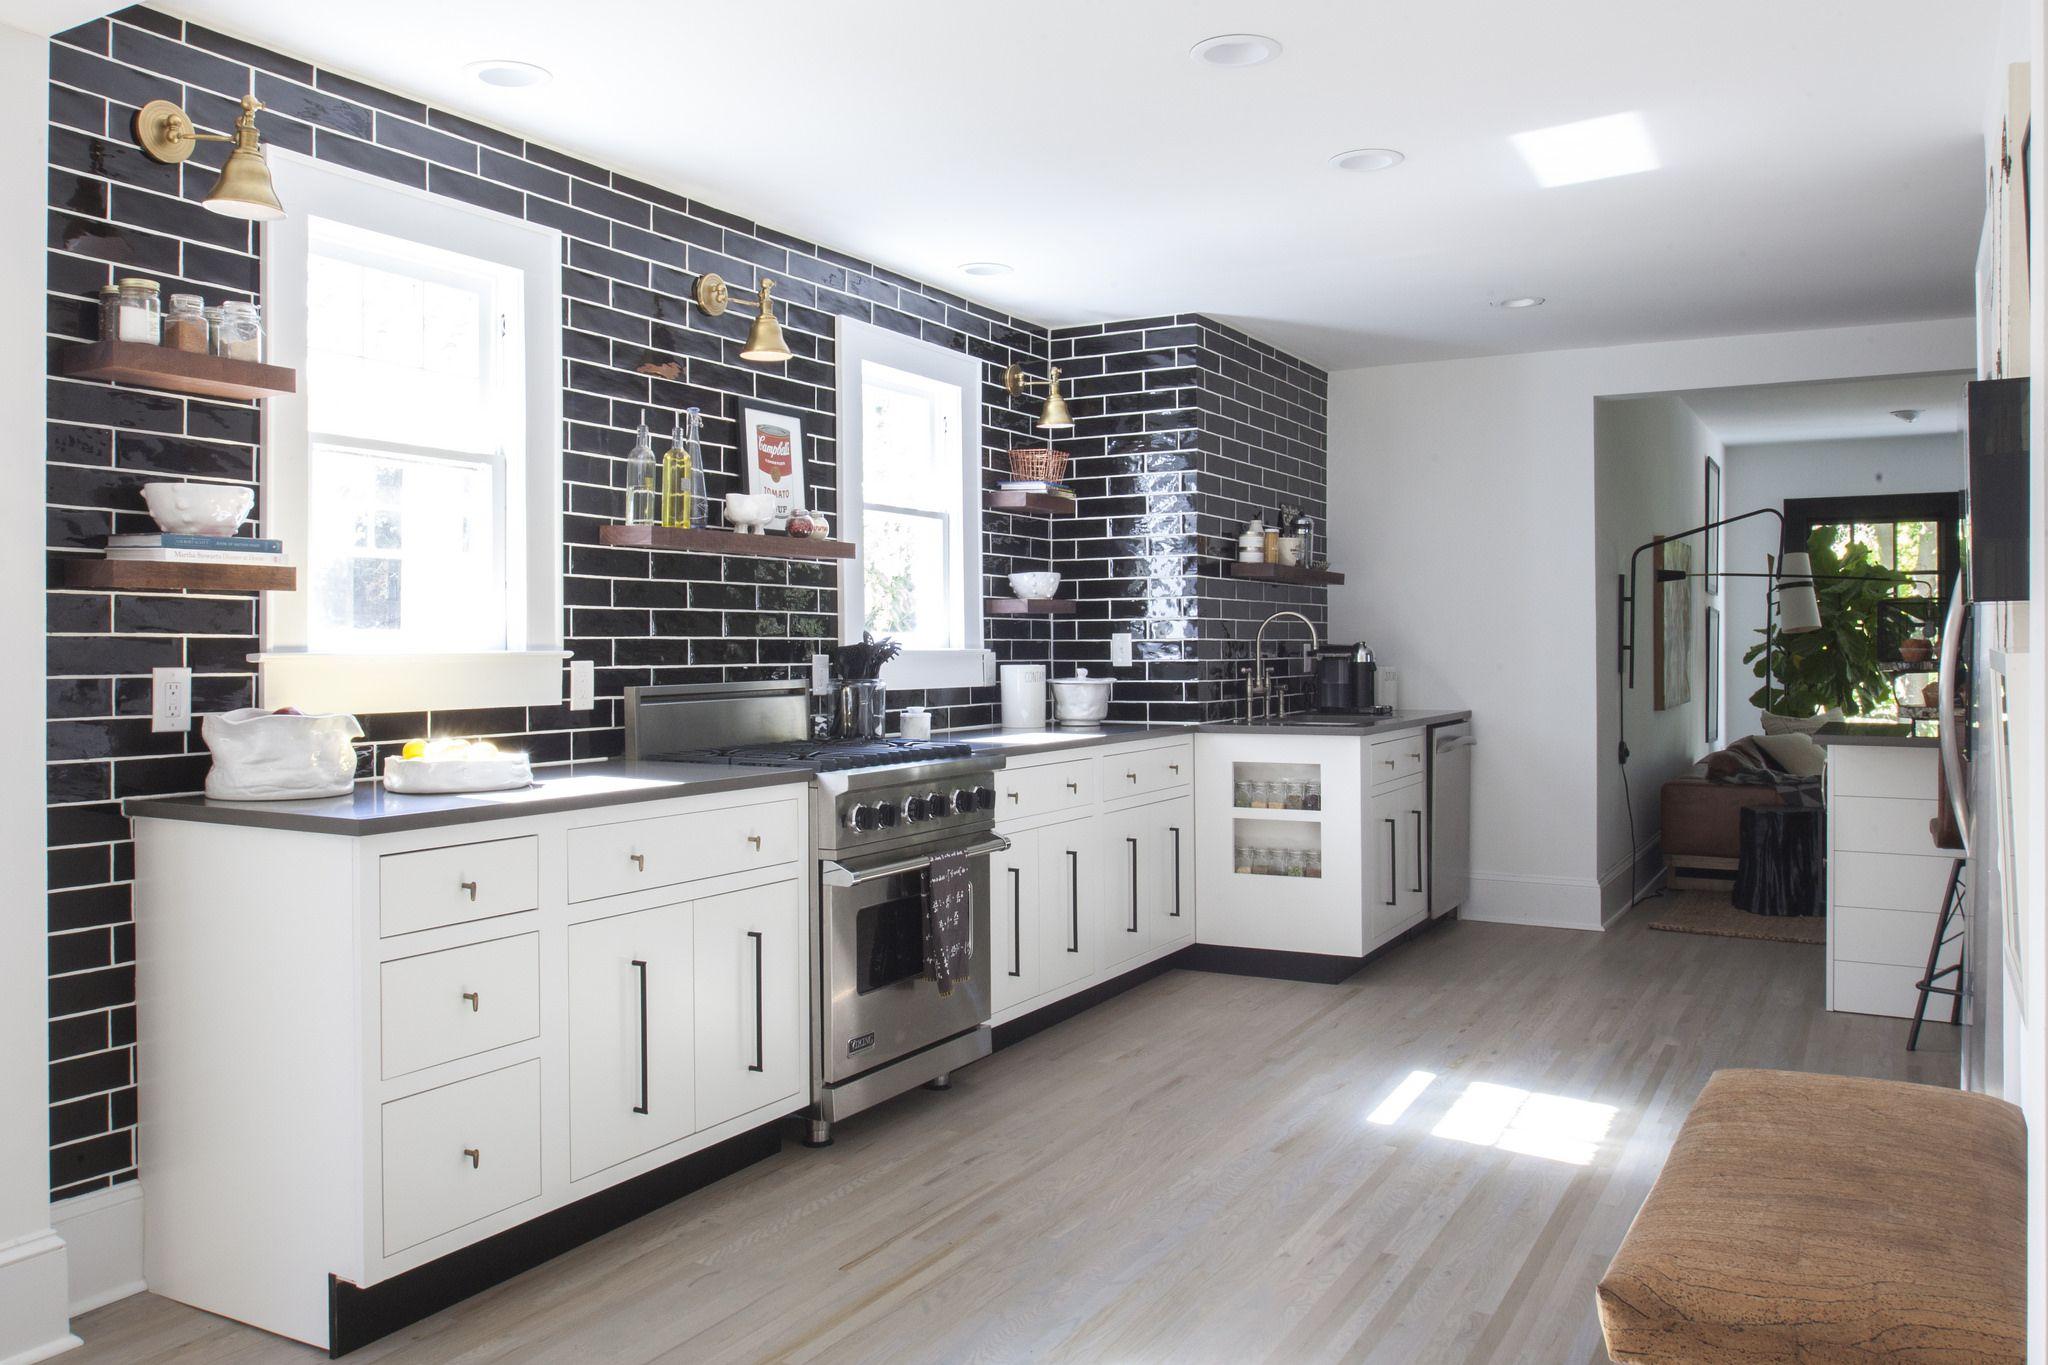 22067473414 67a93a4921 K 1 Jpg Kitchens Without Upper Cabinets Kitchen Design White Kitchen Design